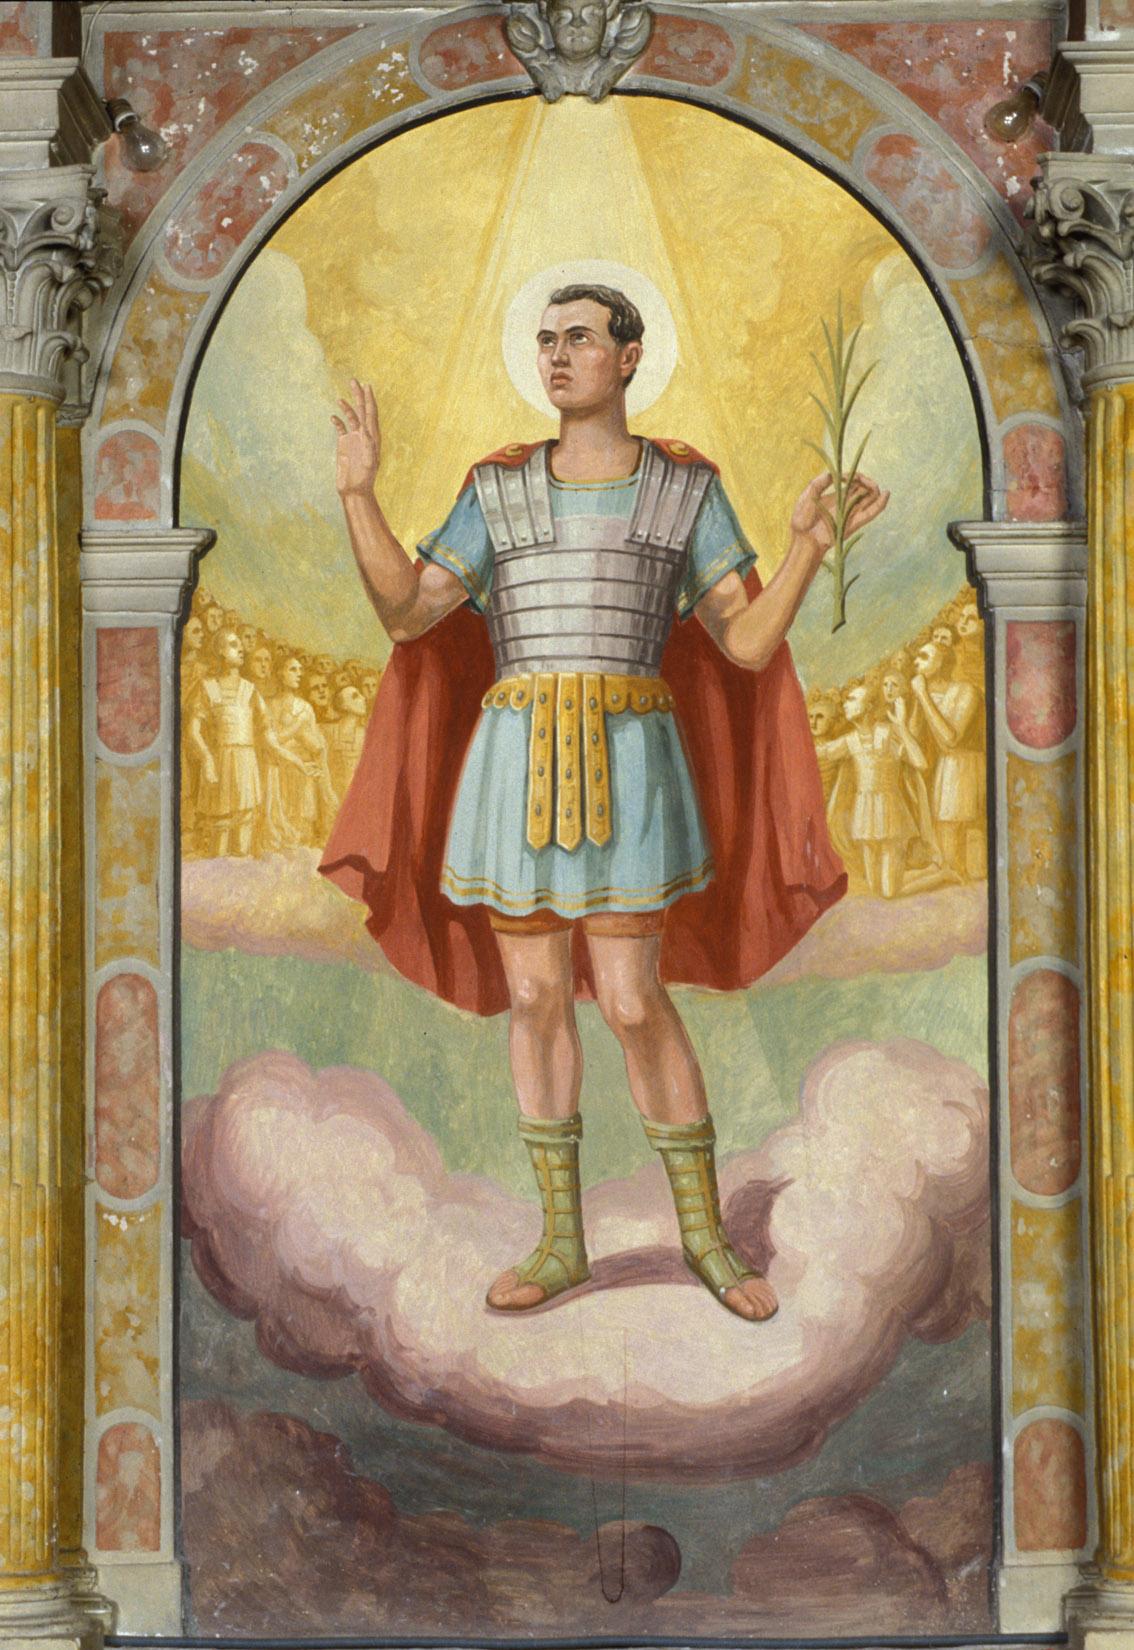 San Giustino dans immagini sacre 8_B0184a